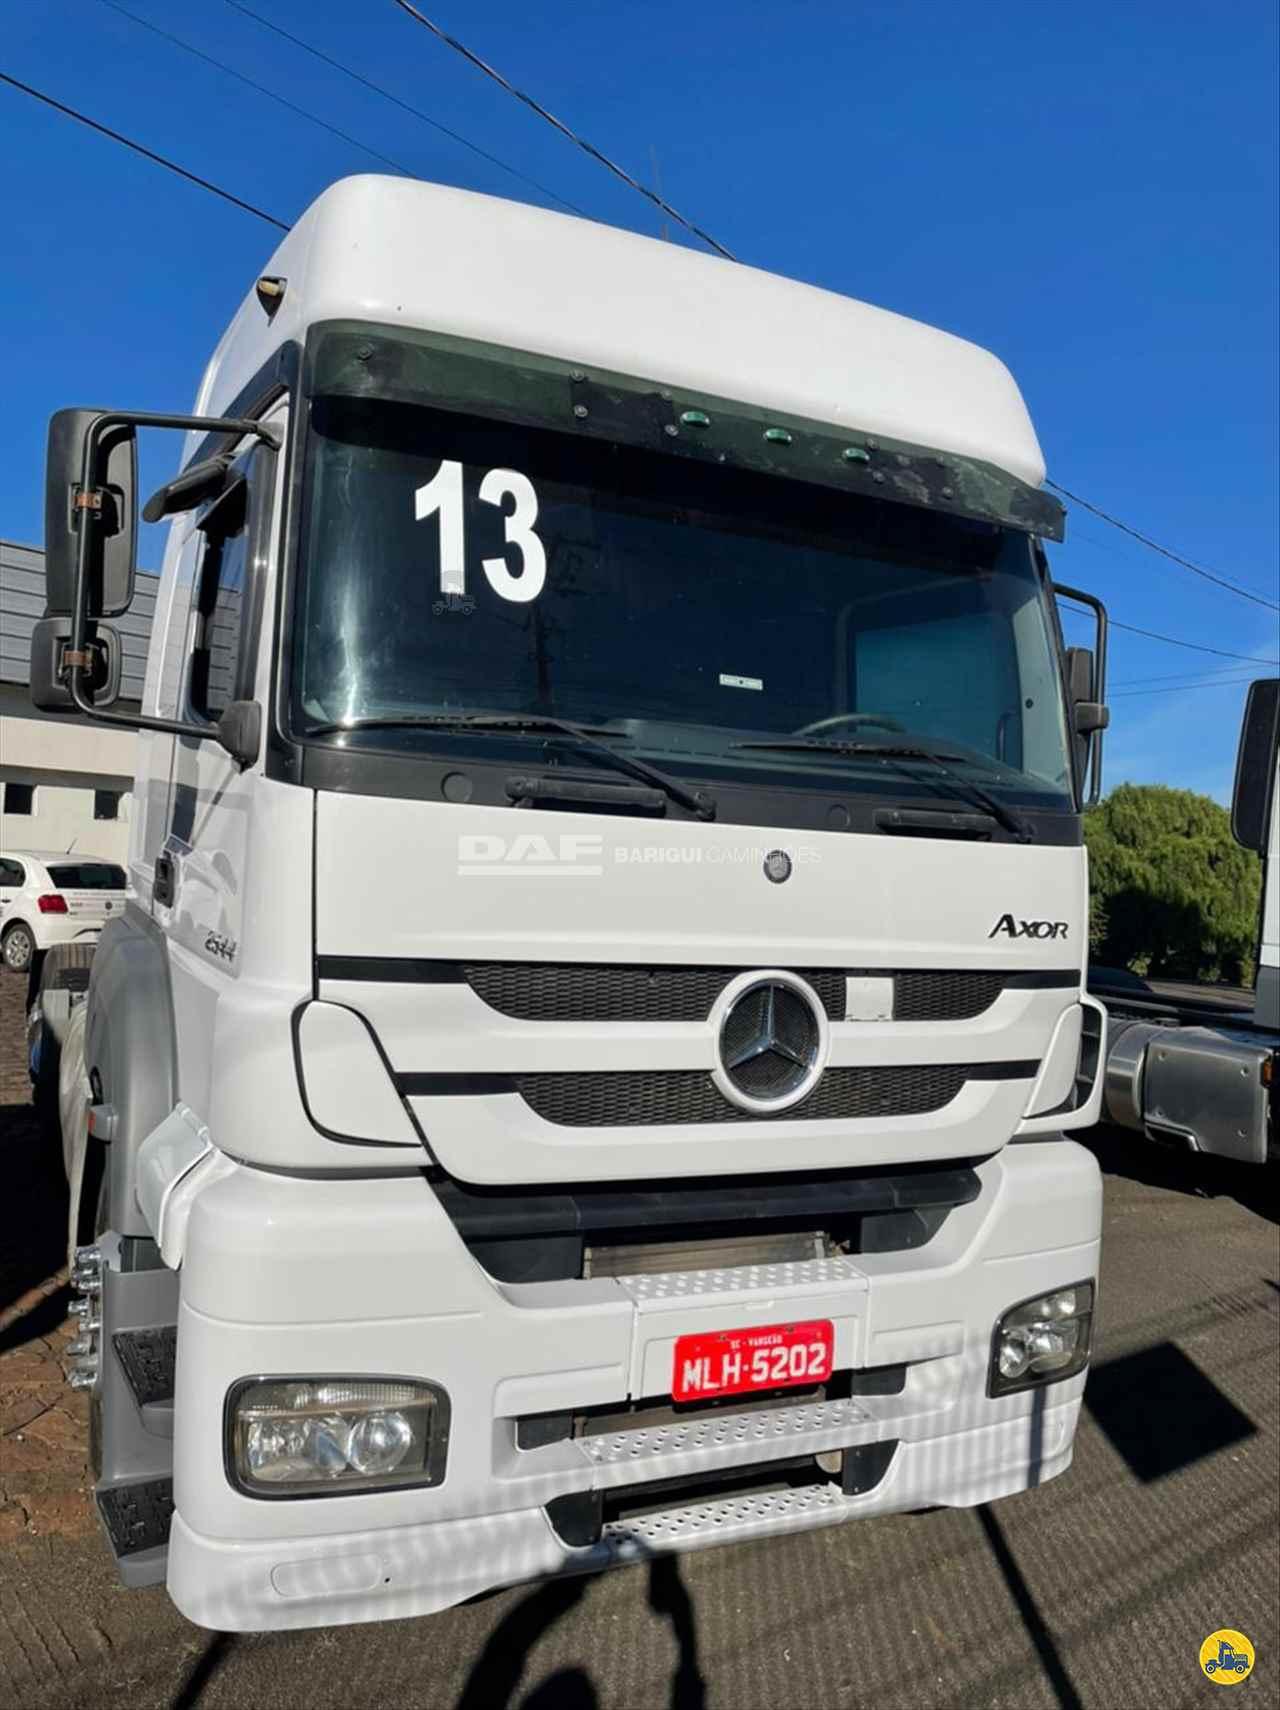 CAMINHAO MERCEDES-BENZ MB 2544 Cavalo Mecânico Truck 6x2 DAF Barigui Chapecó (Cordilheira Alta) CORDILHEIRA ALTA SANTA CATARINA SC